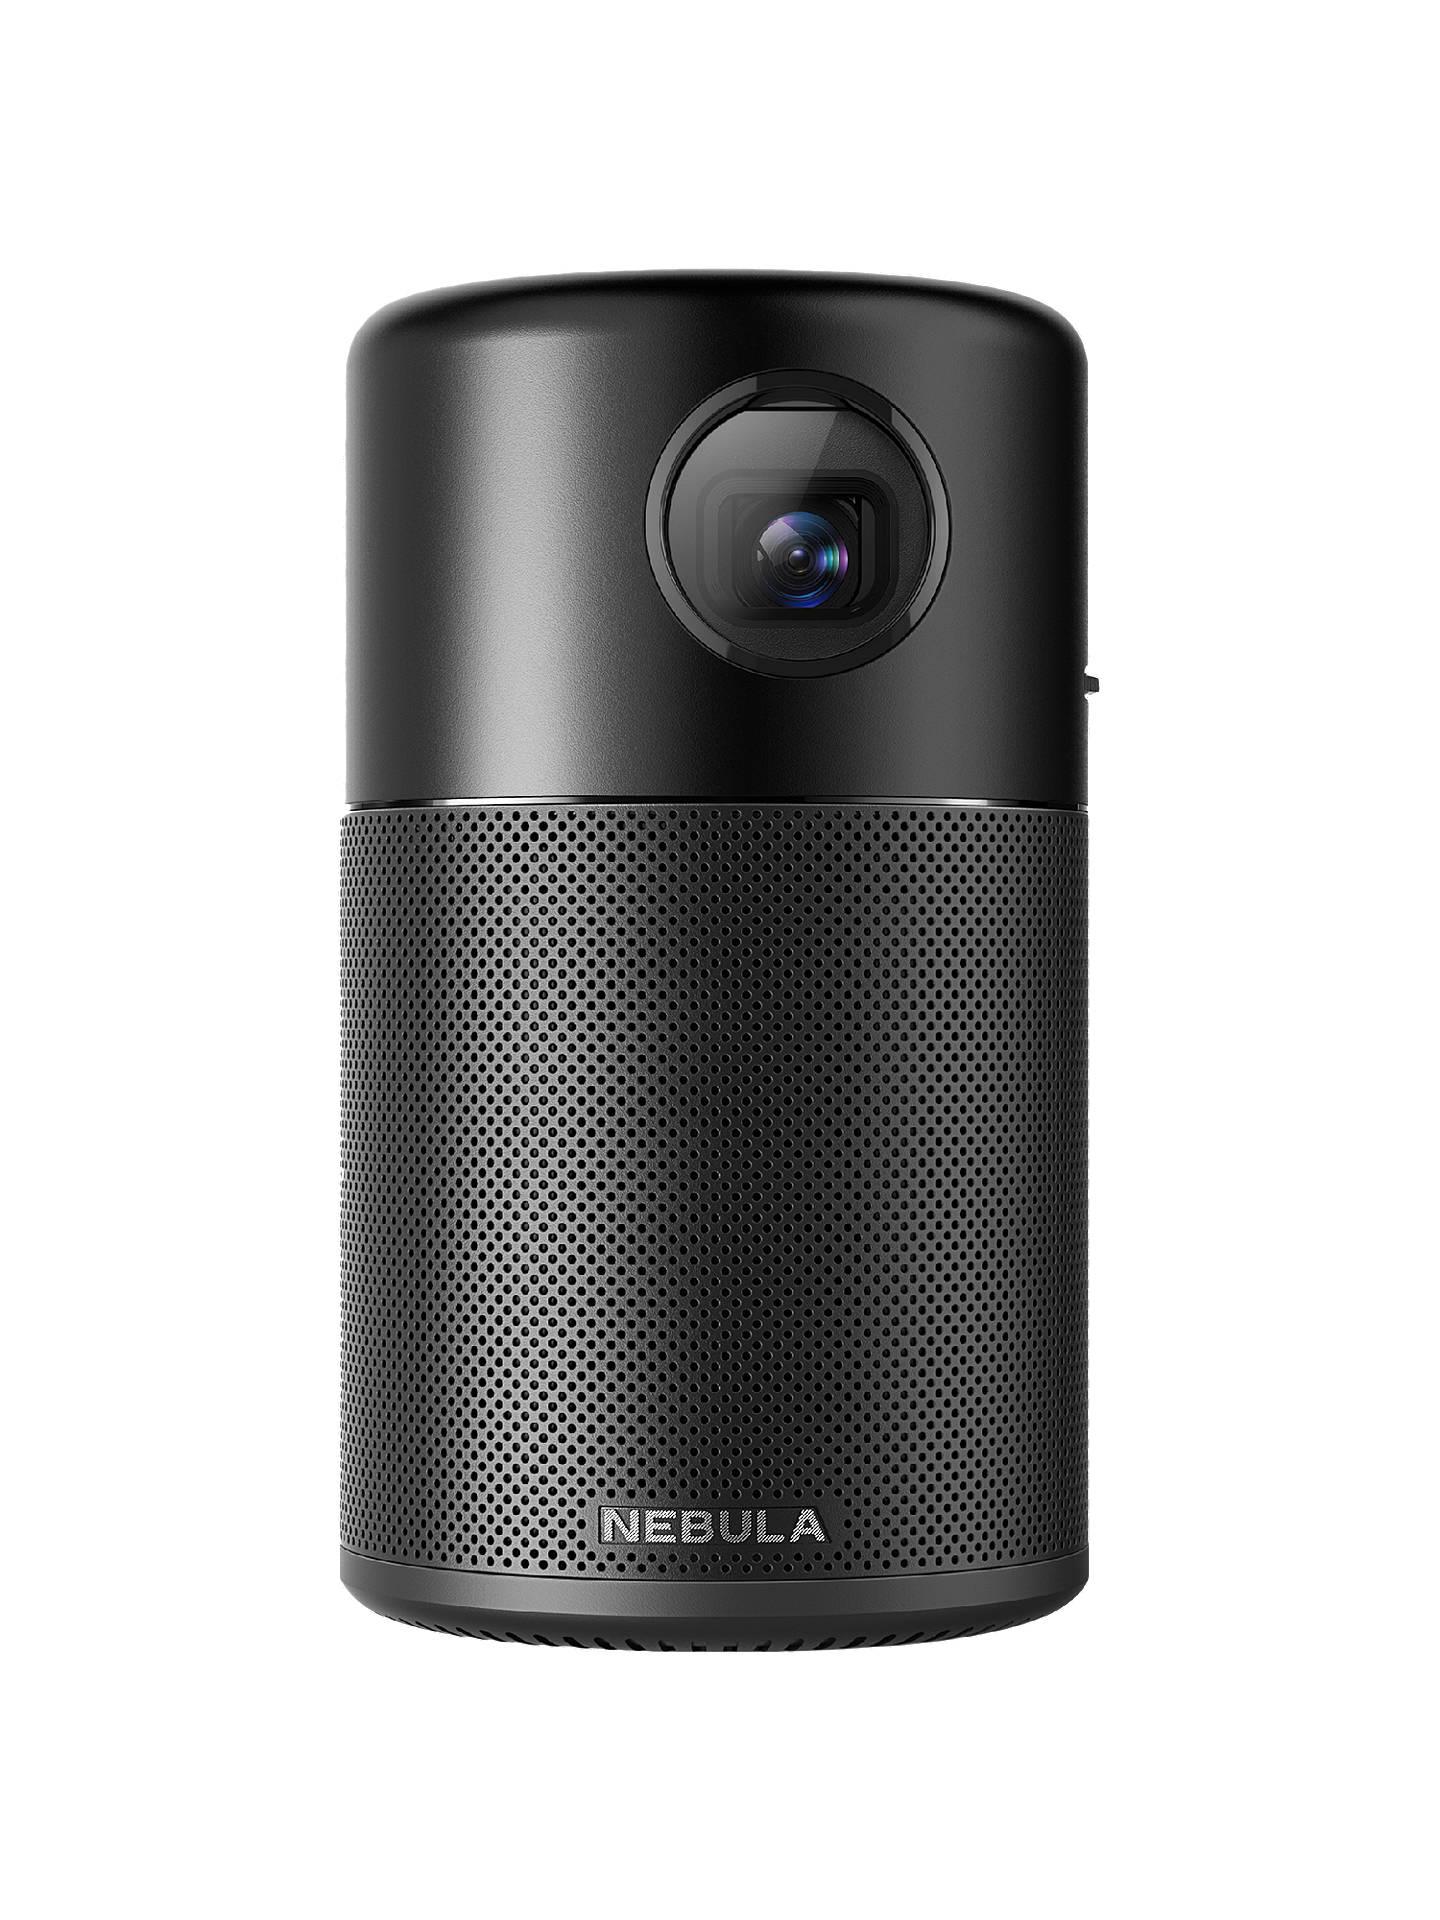 dce94b9ef0cca0 Buy Nebula Capsule HD Ready Smart Mini Projector, 100 Lumens Online at  johnlewis.com ...